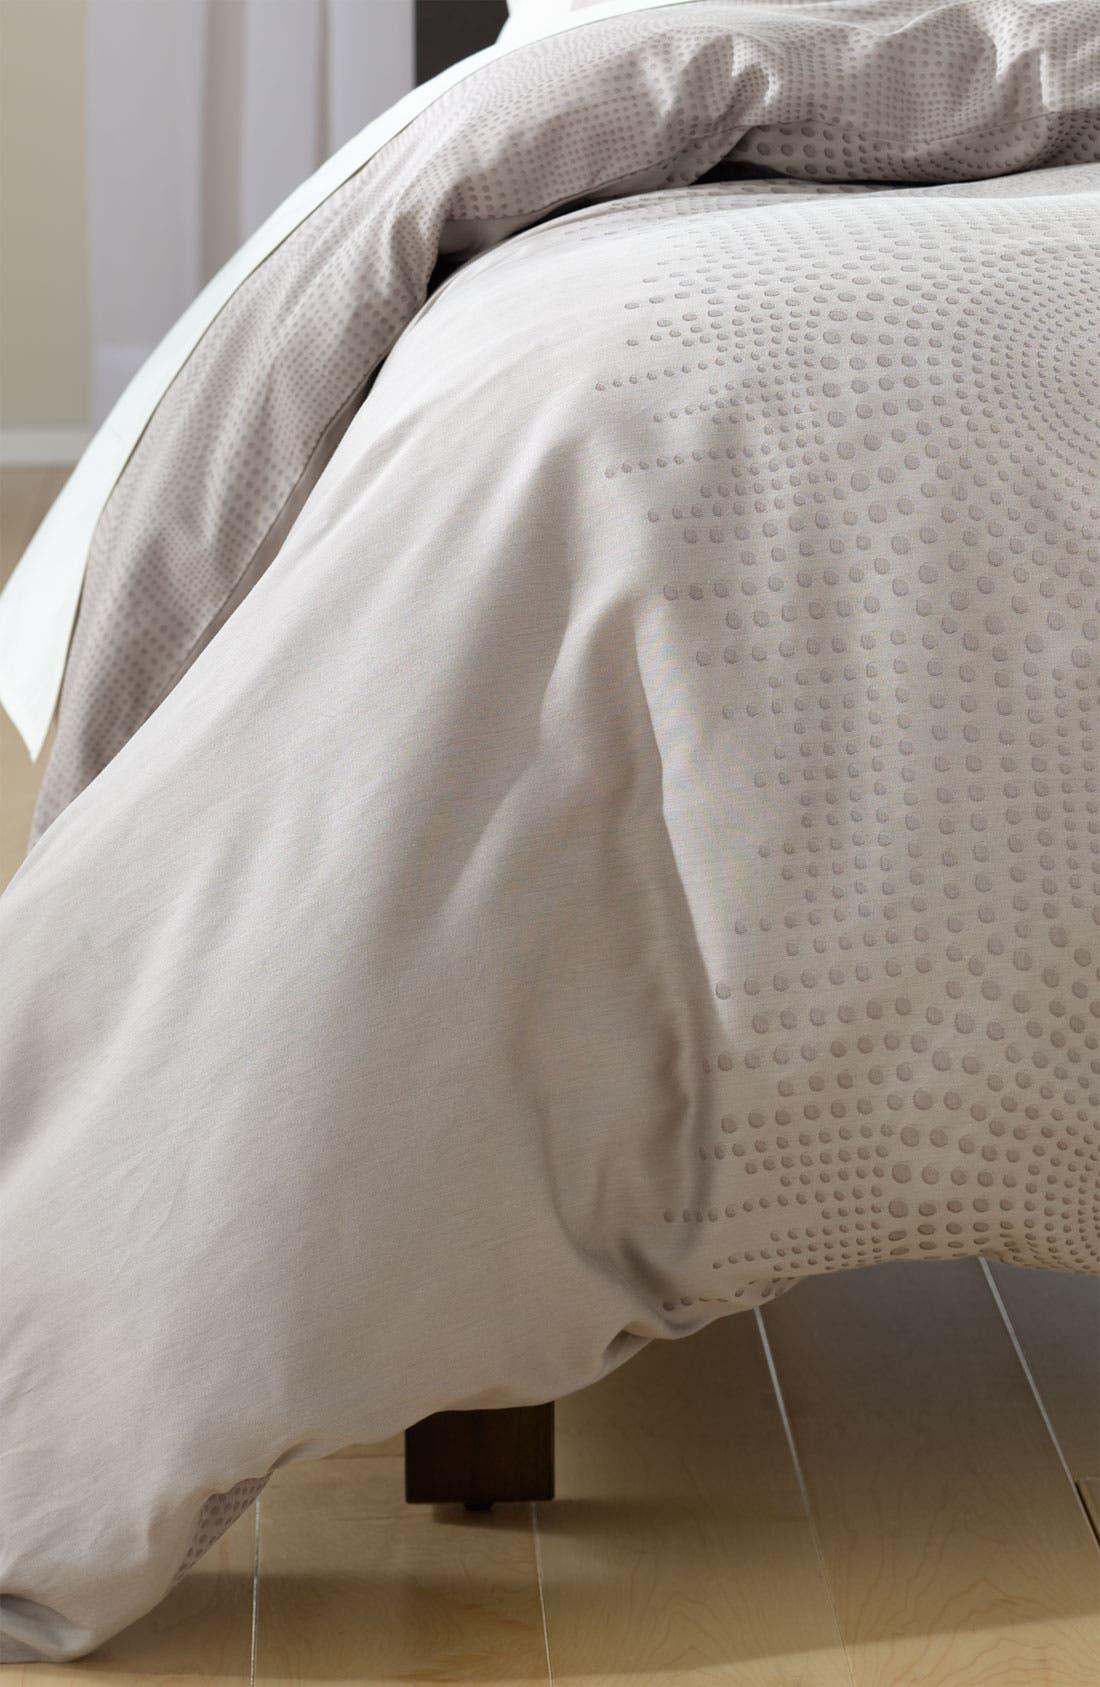 Main Image - Nordstrom at Home 'Raindrops' Jacquard Duvet Cover